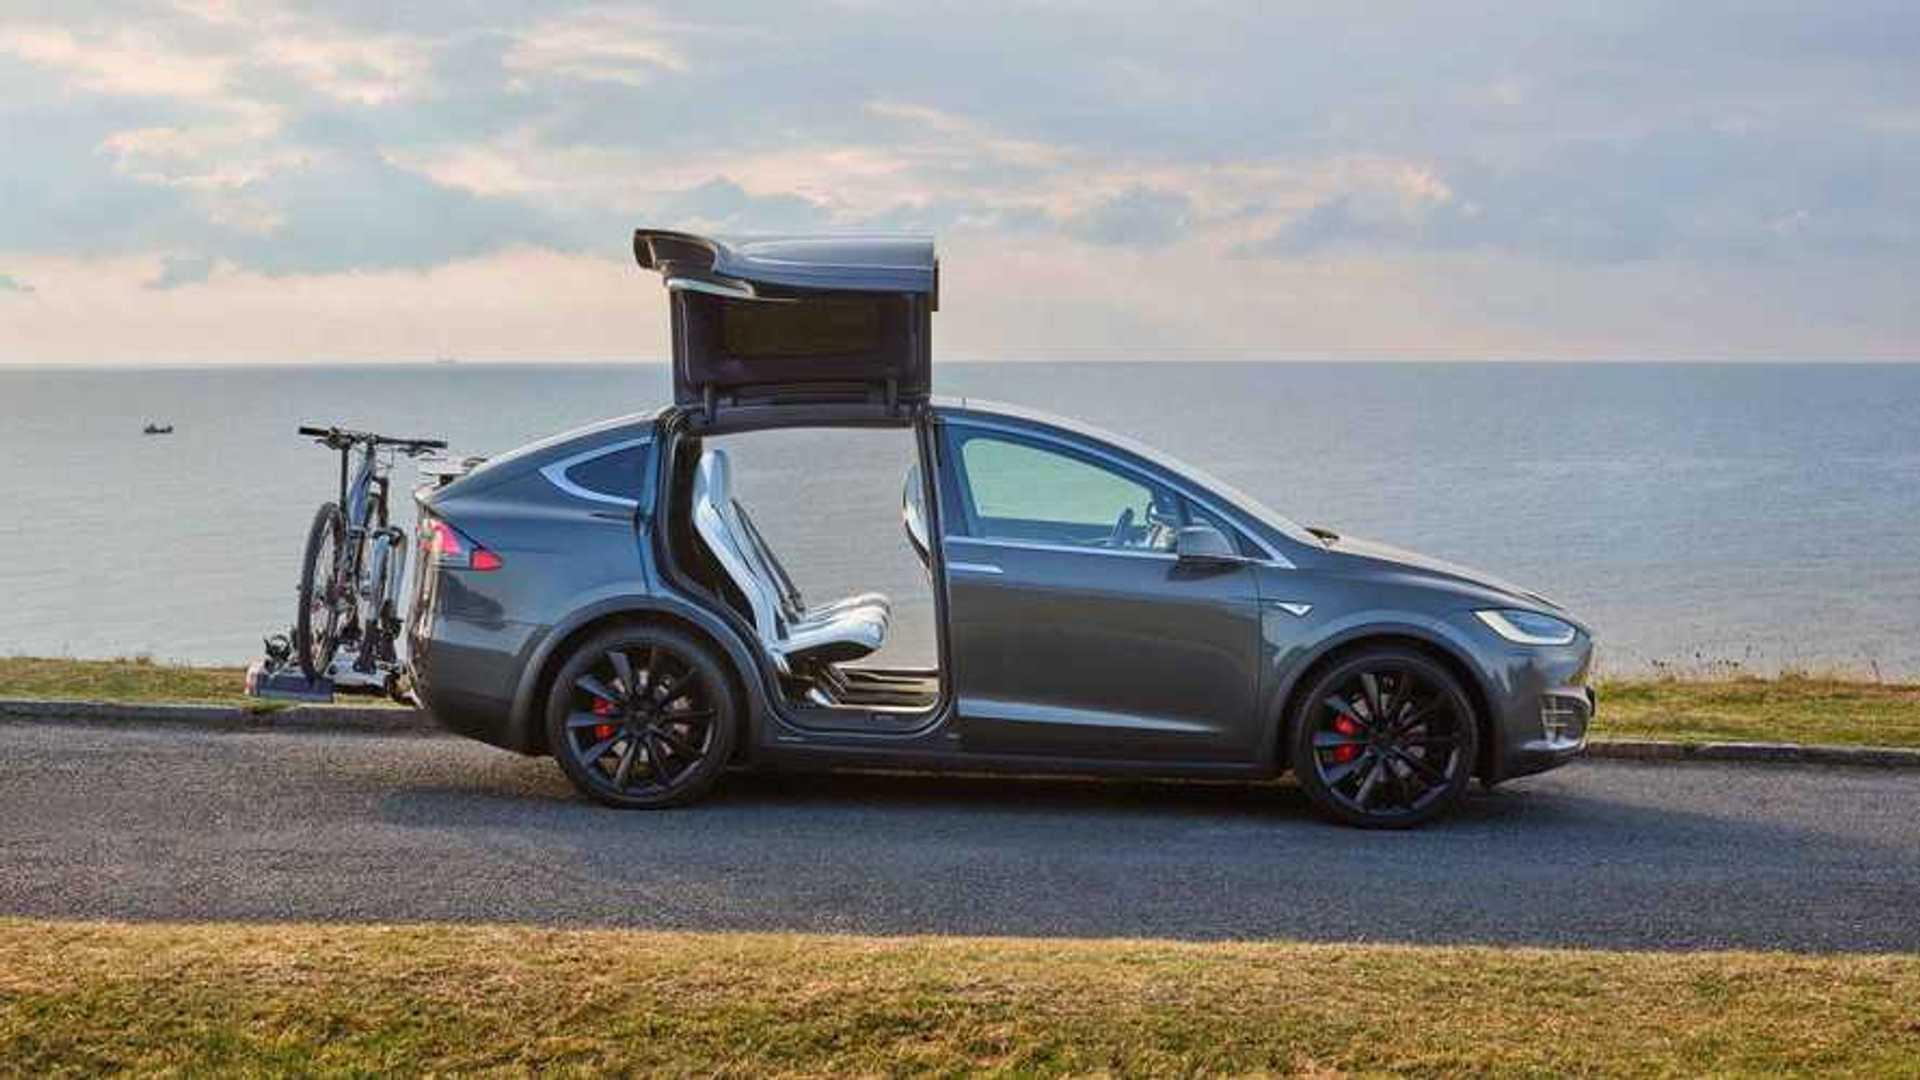 Dubai Gets A Tesla Model X Driver's Ed Car